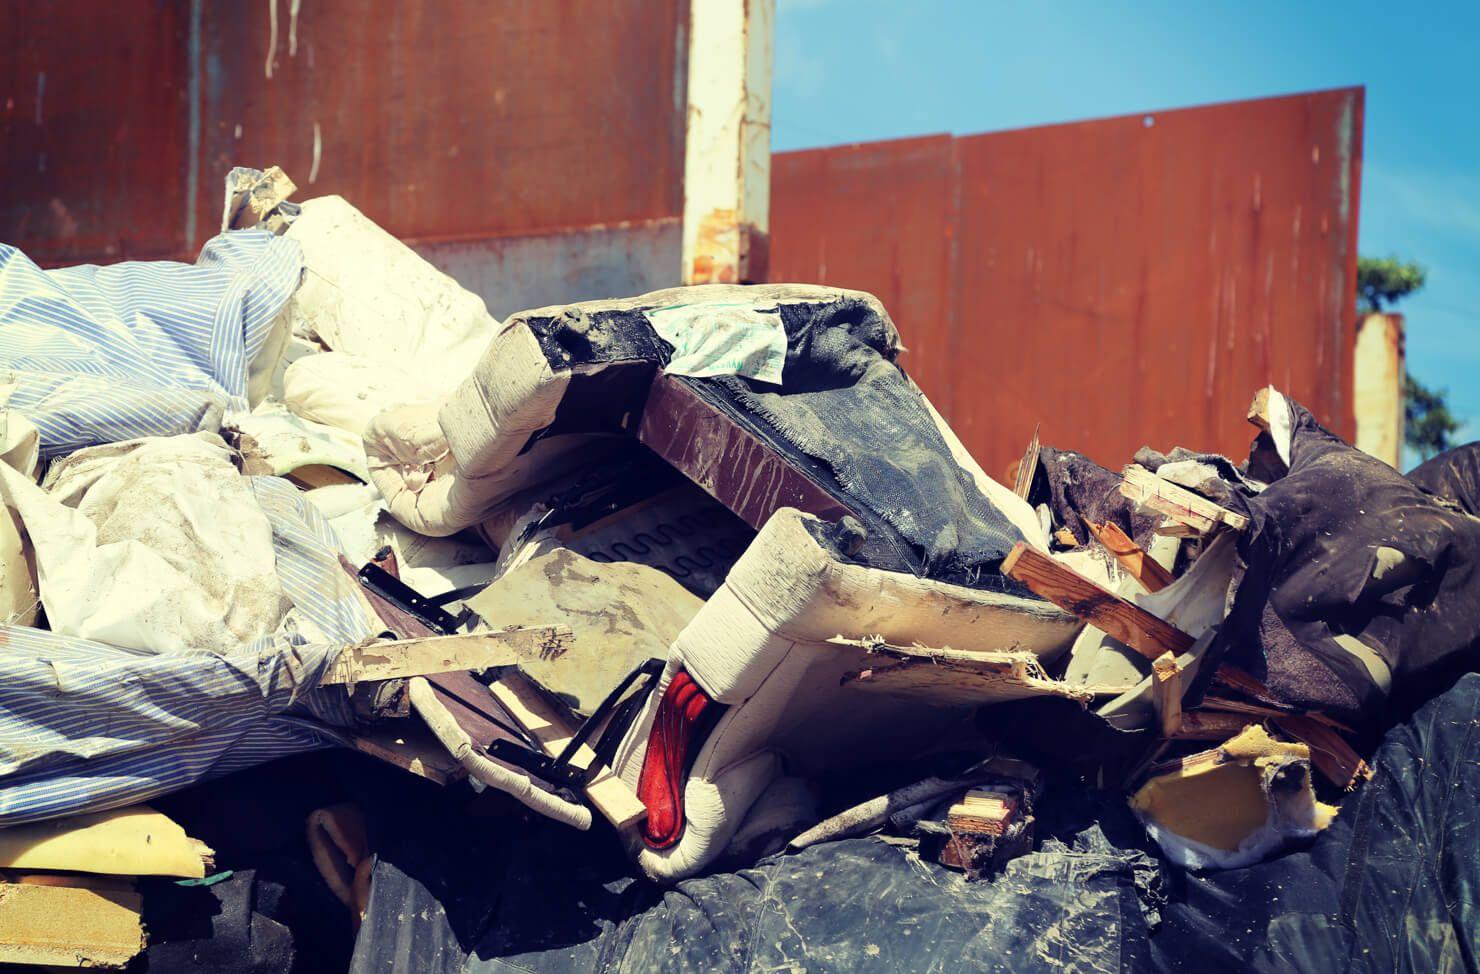 Sofas to be shredded